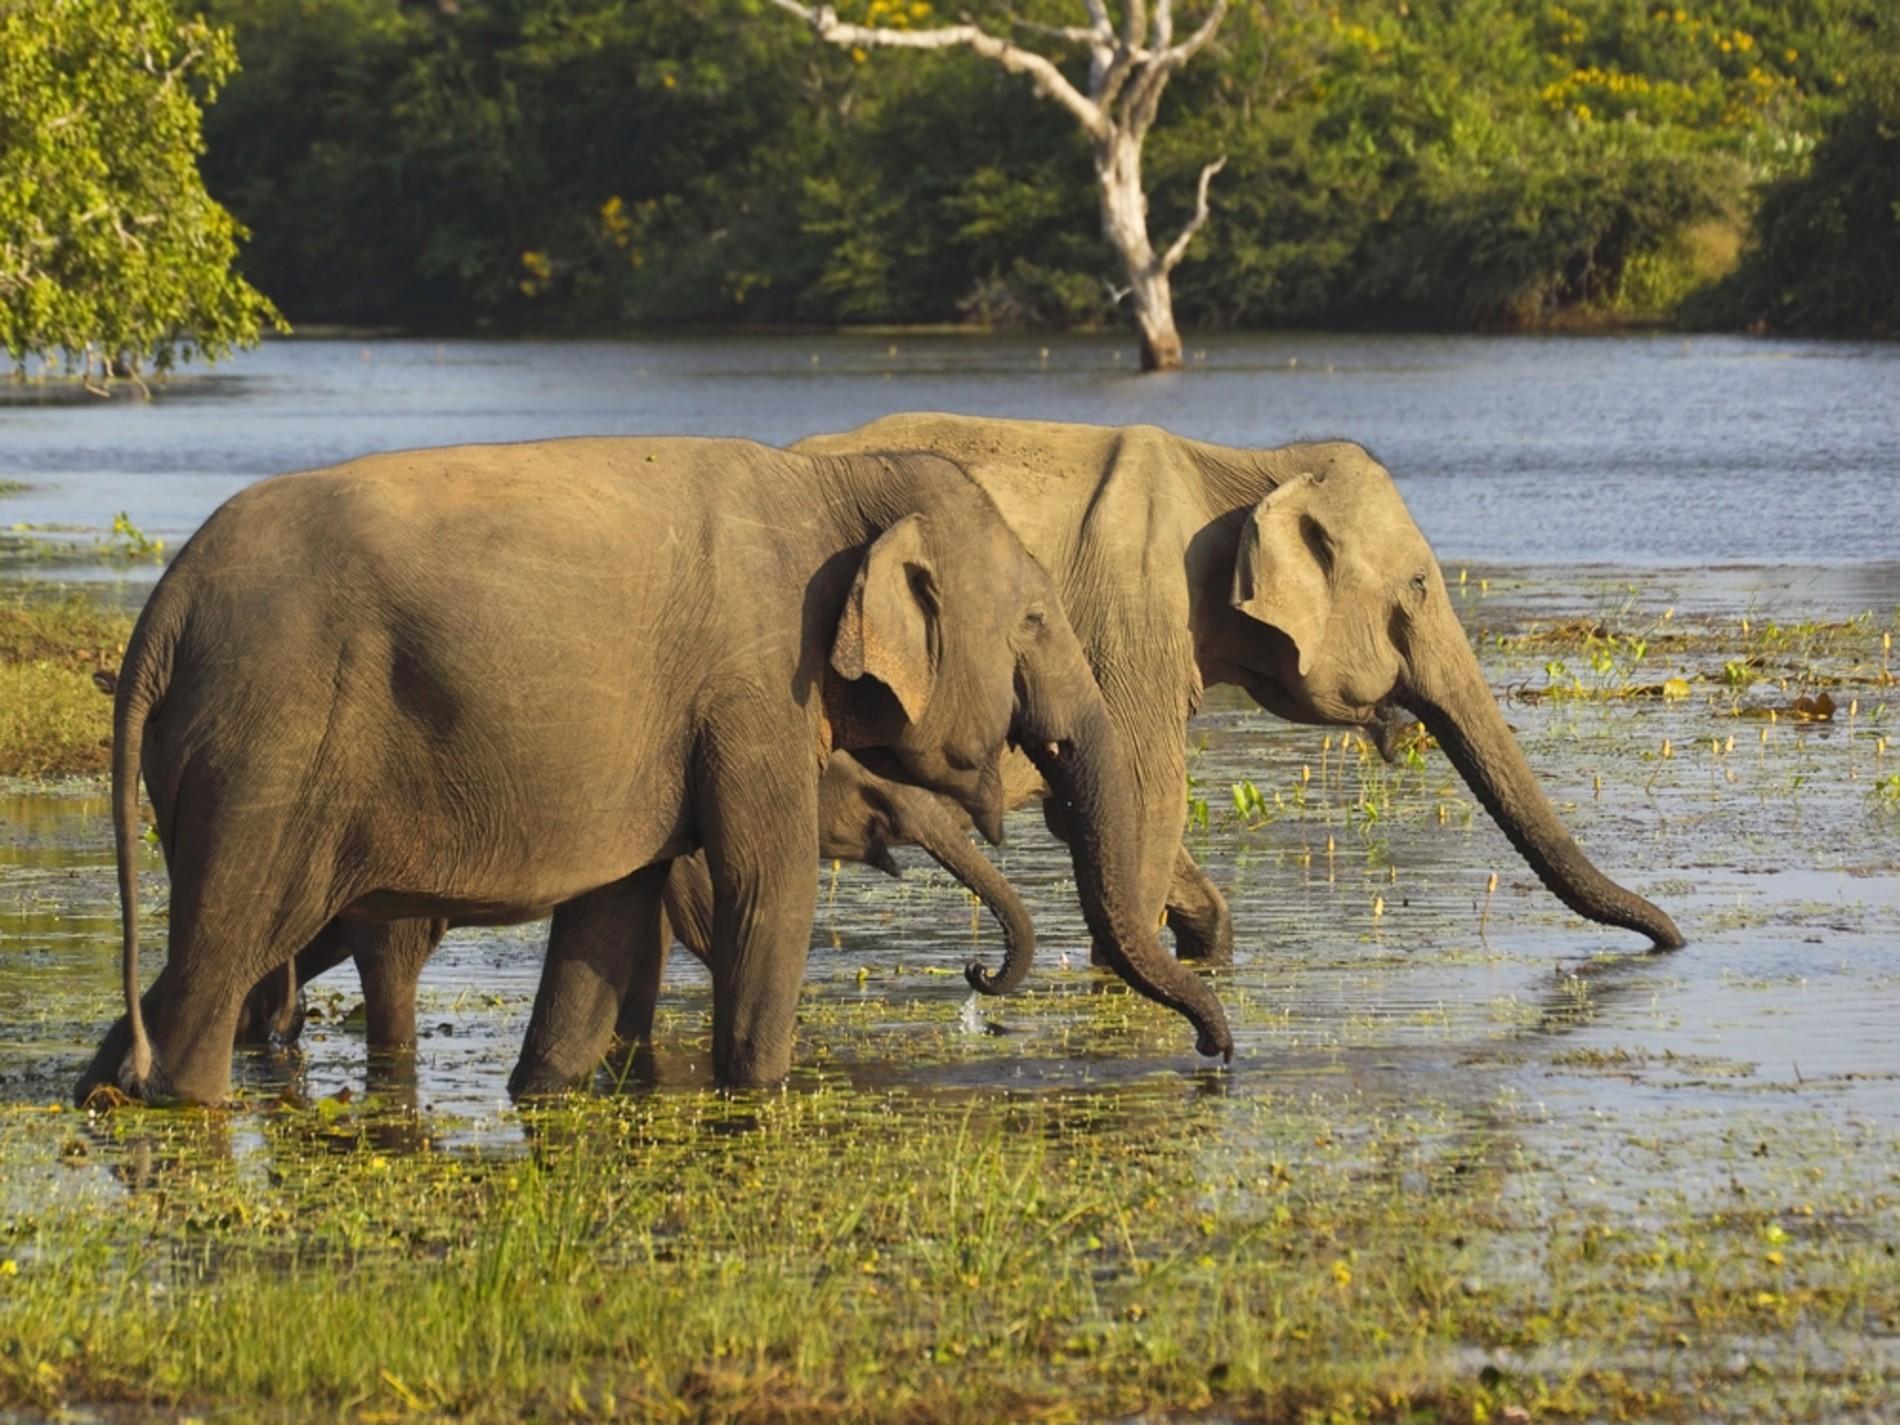 Sri Lanka holidays: Elephants grazing in Yala